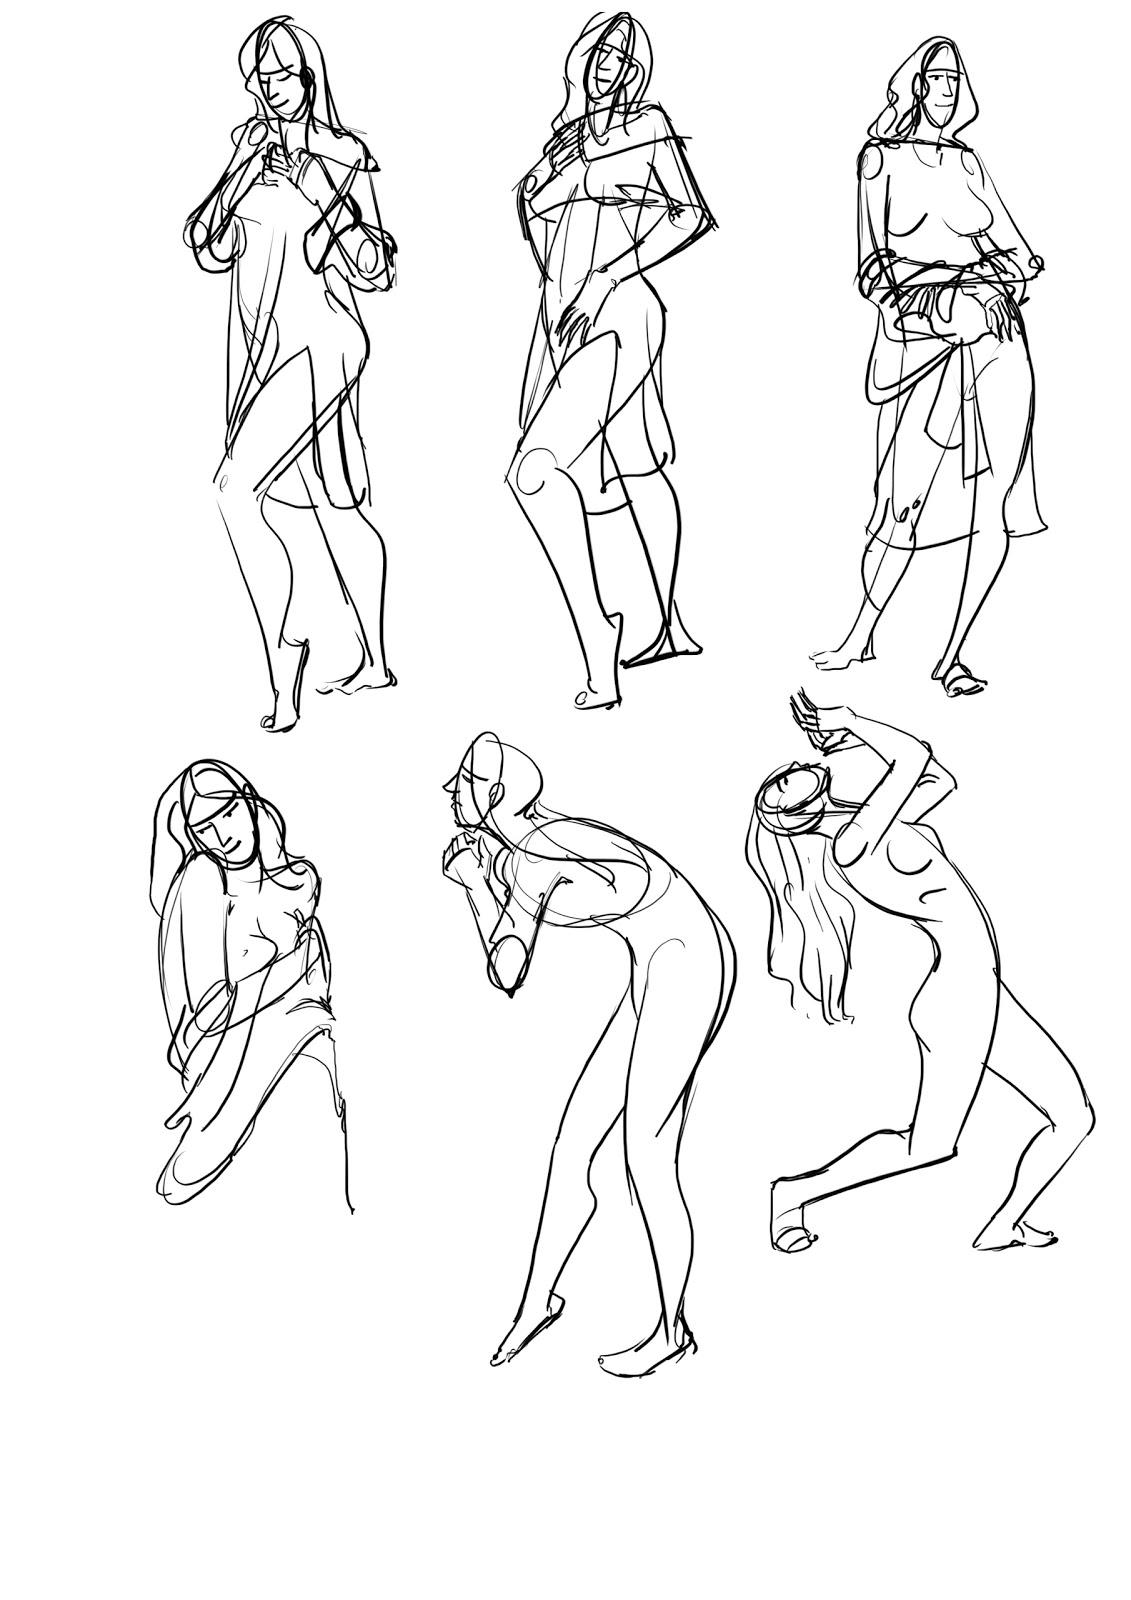 SaiprasaD: Some Gesture Drawing